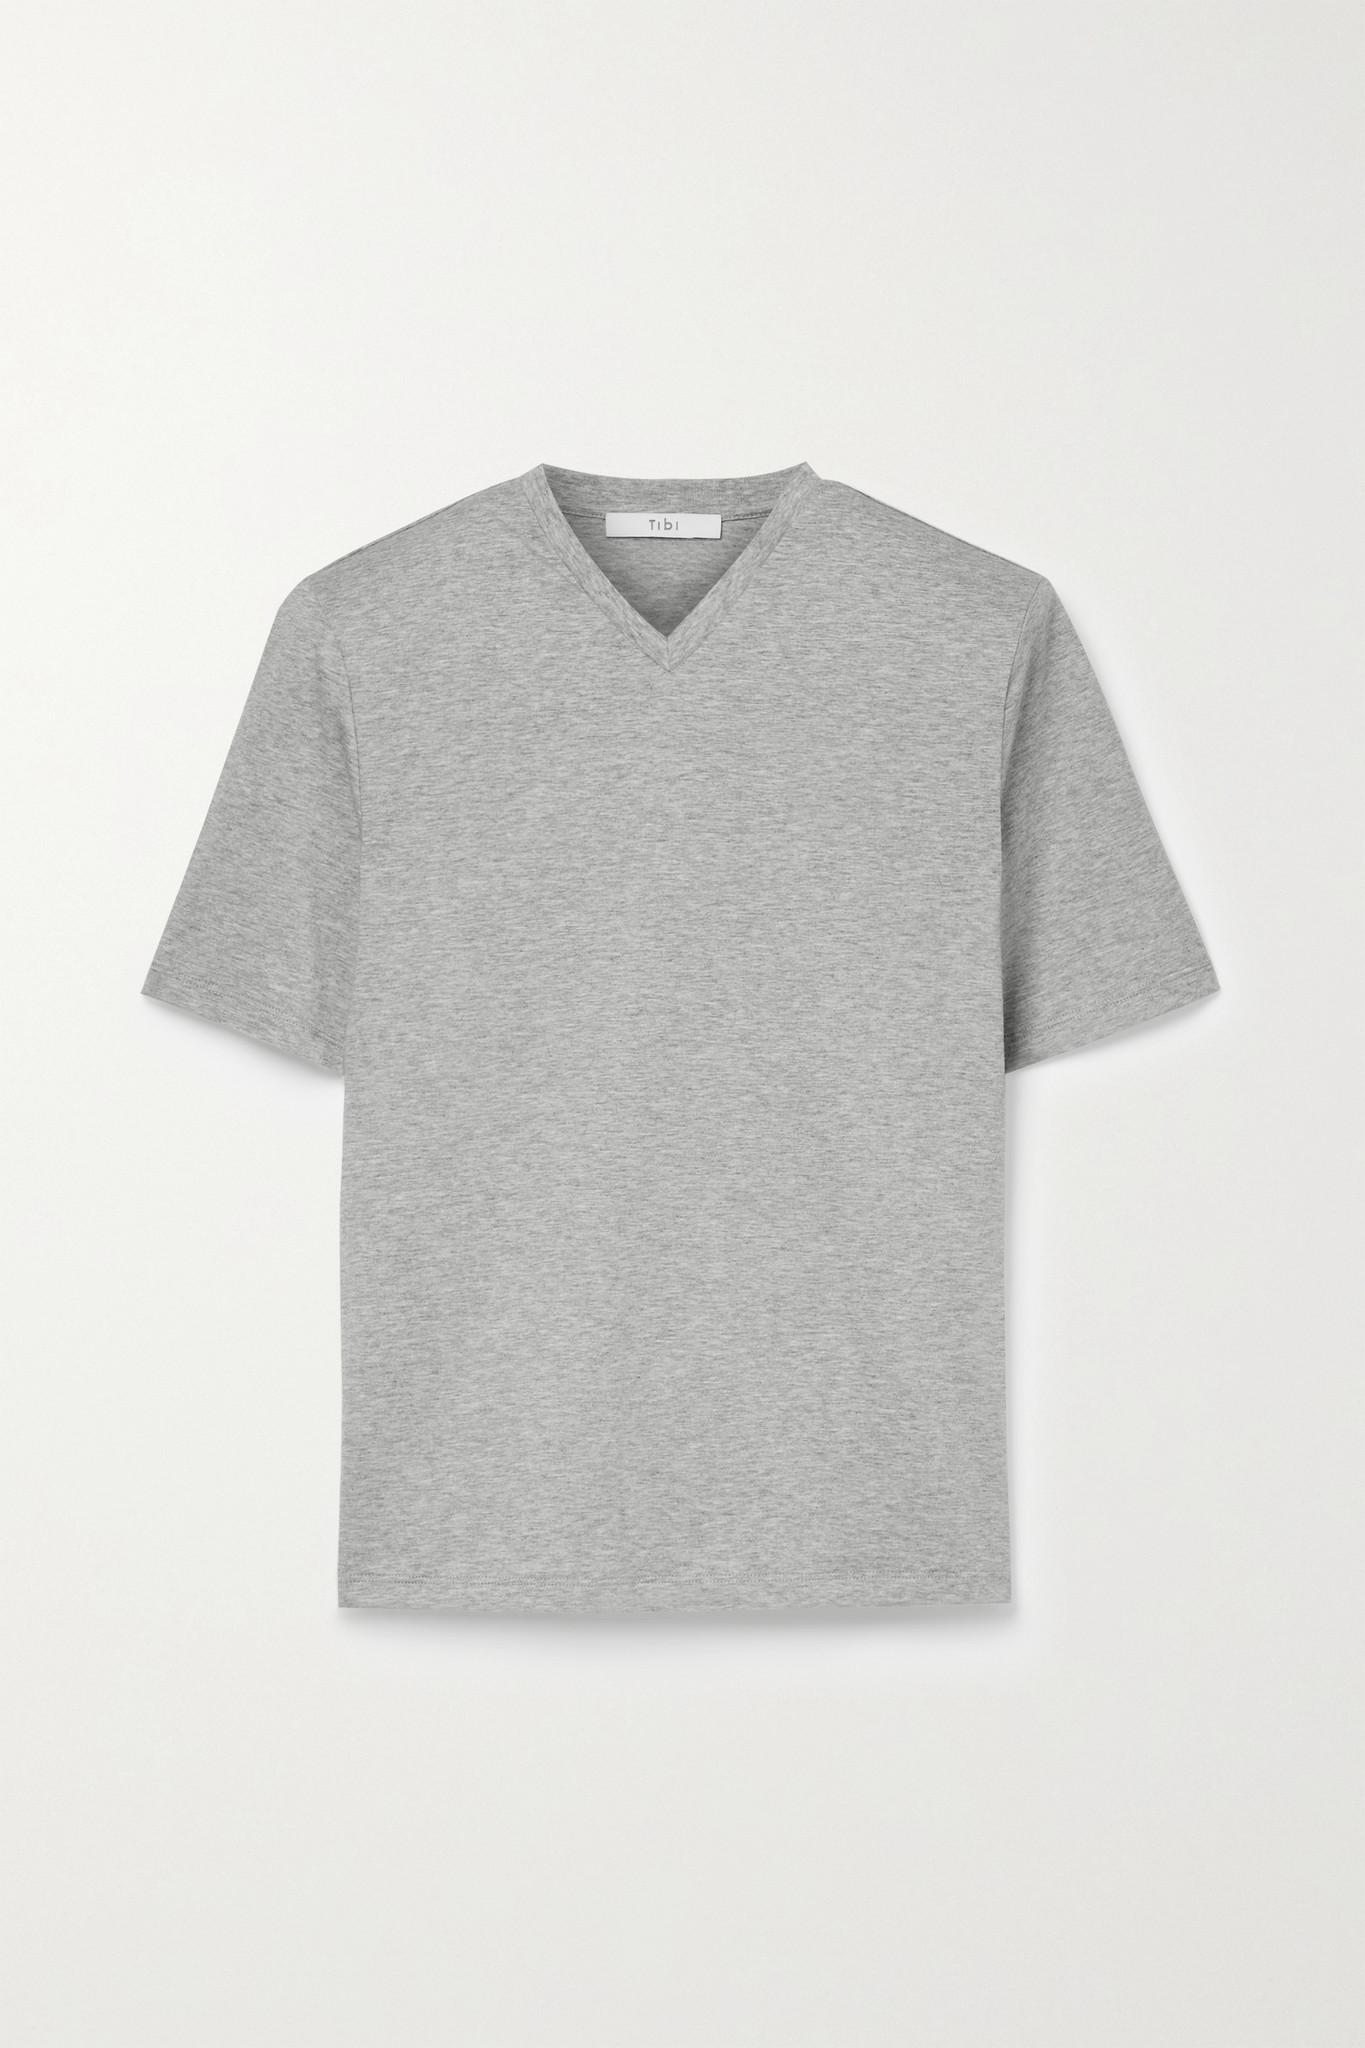 TIBI - Tess 纯棉平纹布 T 恤 - 灰色 - large